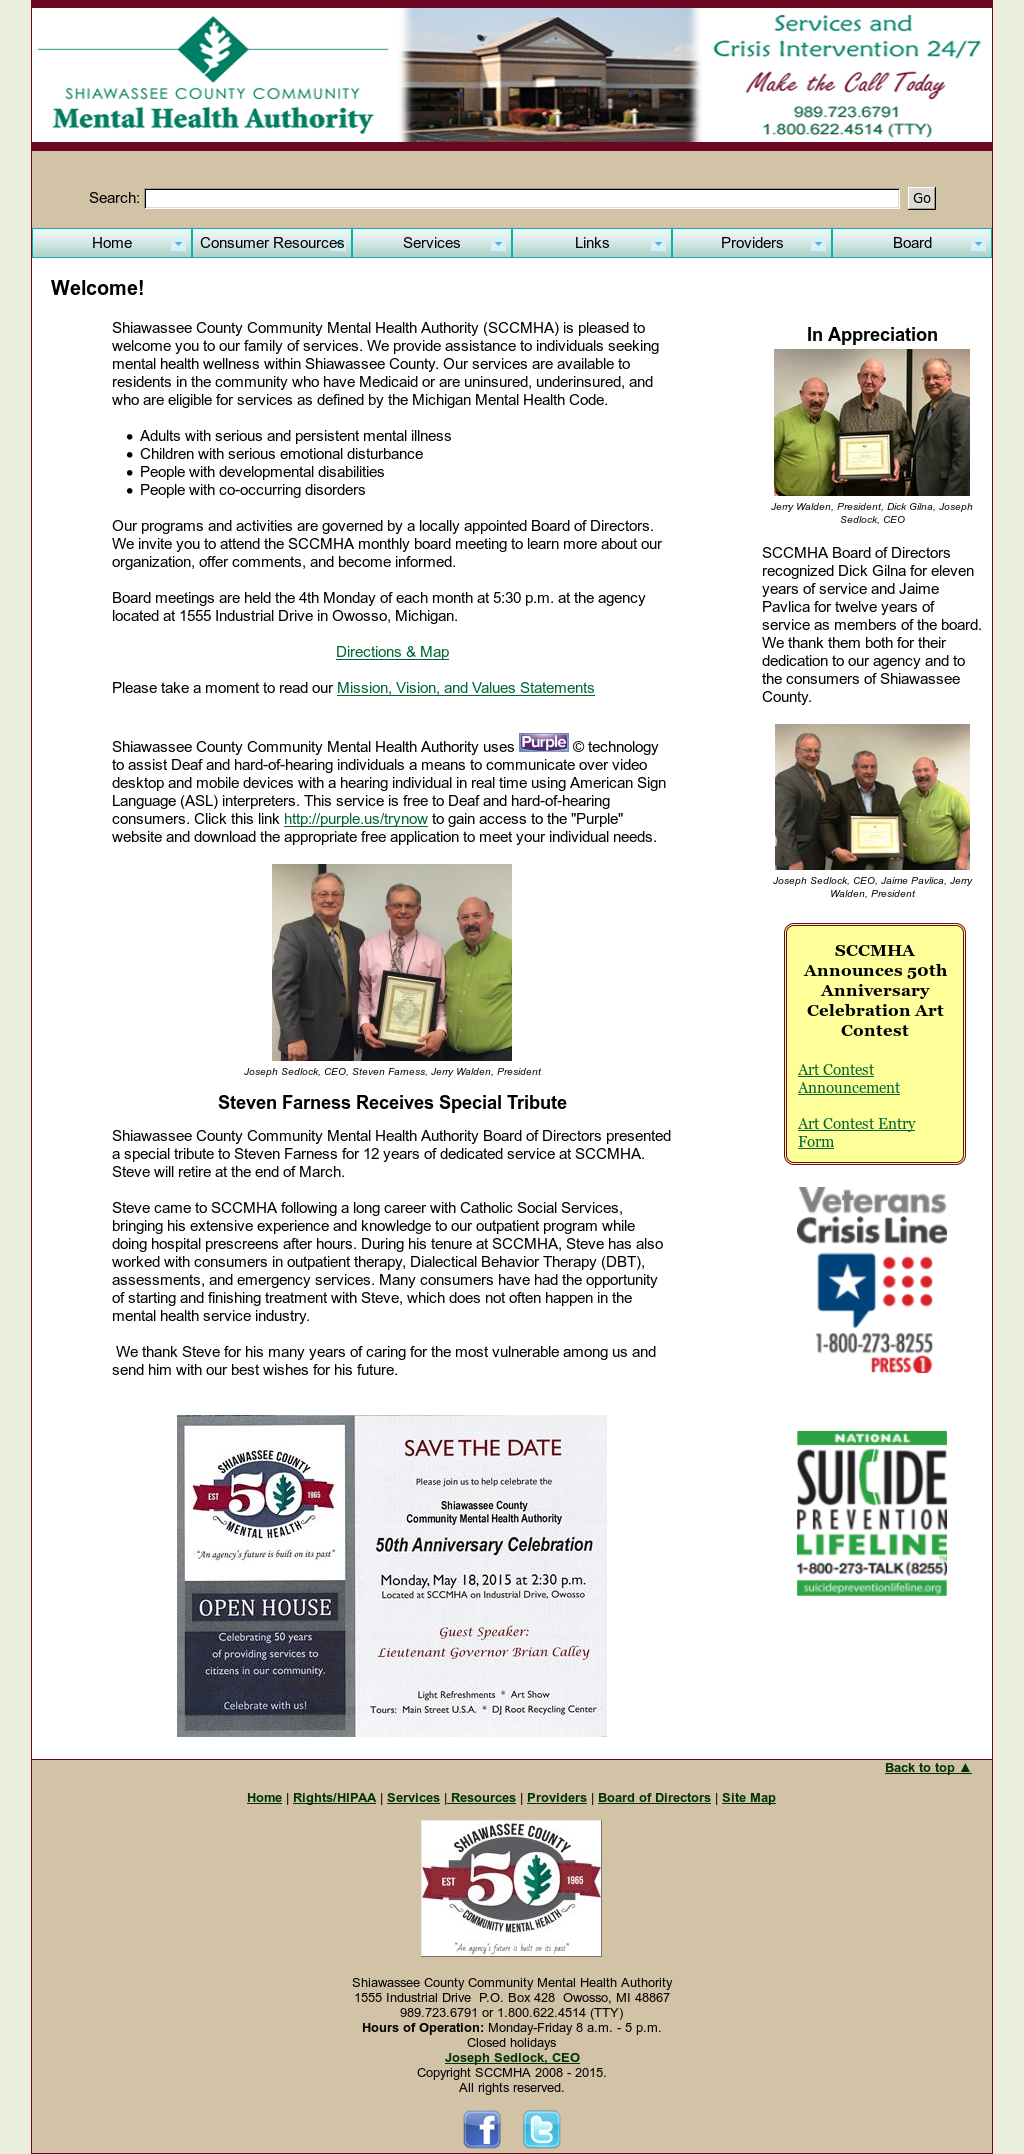 shiawassee county community mental health